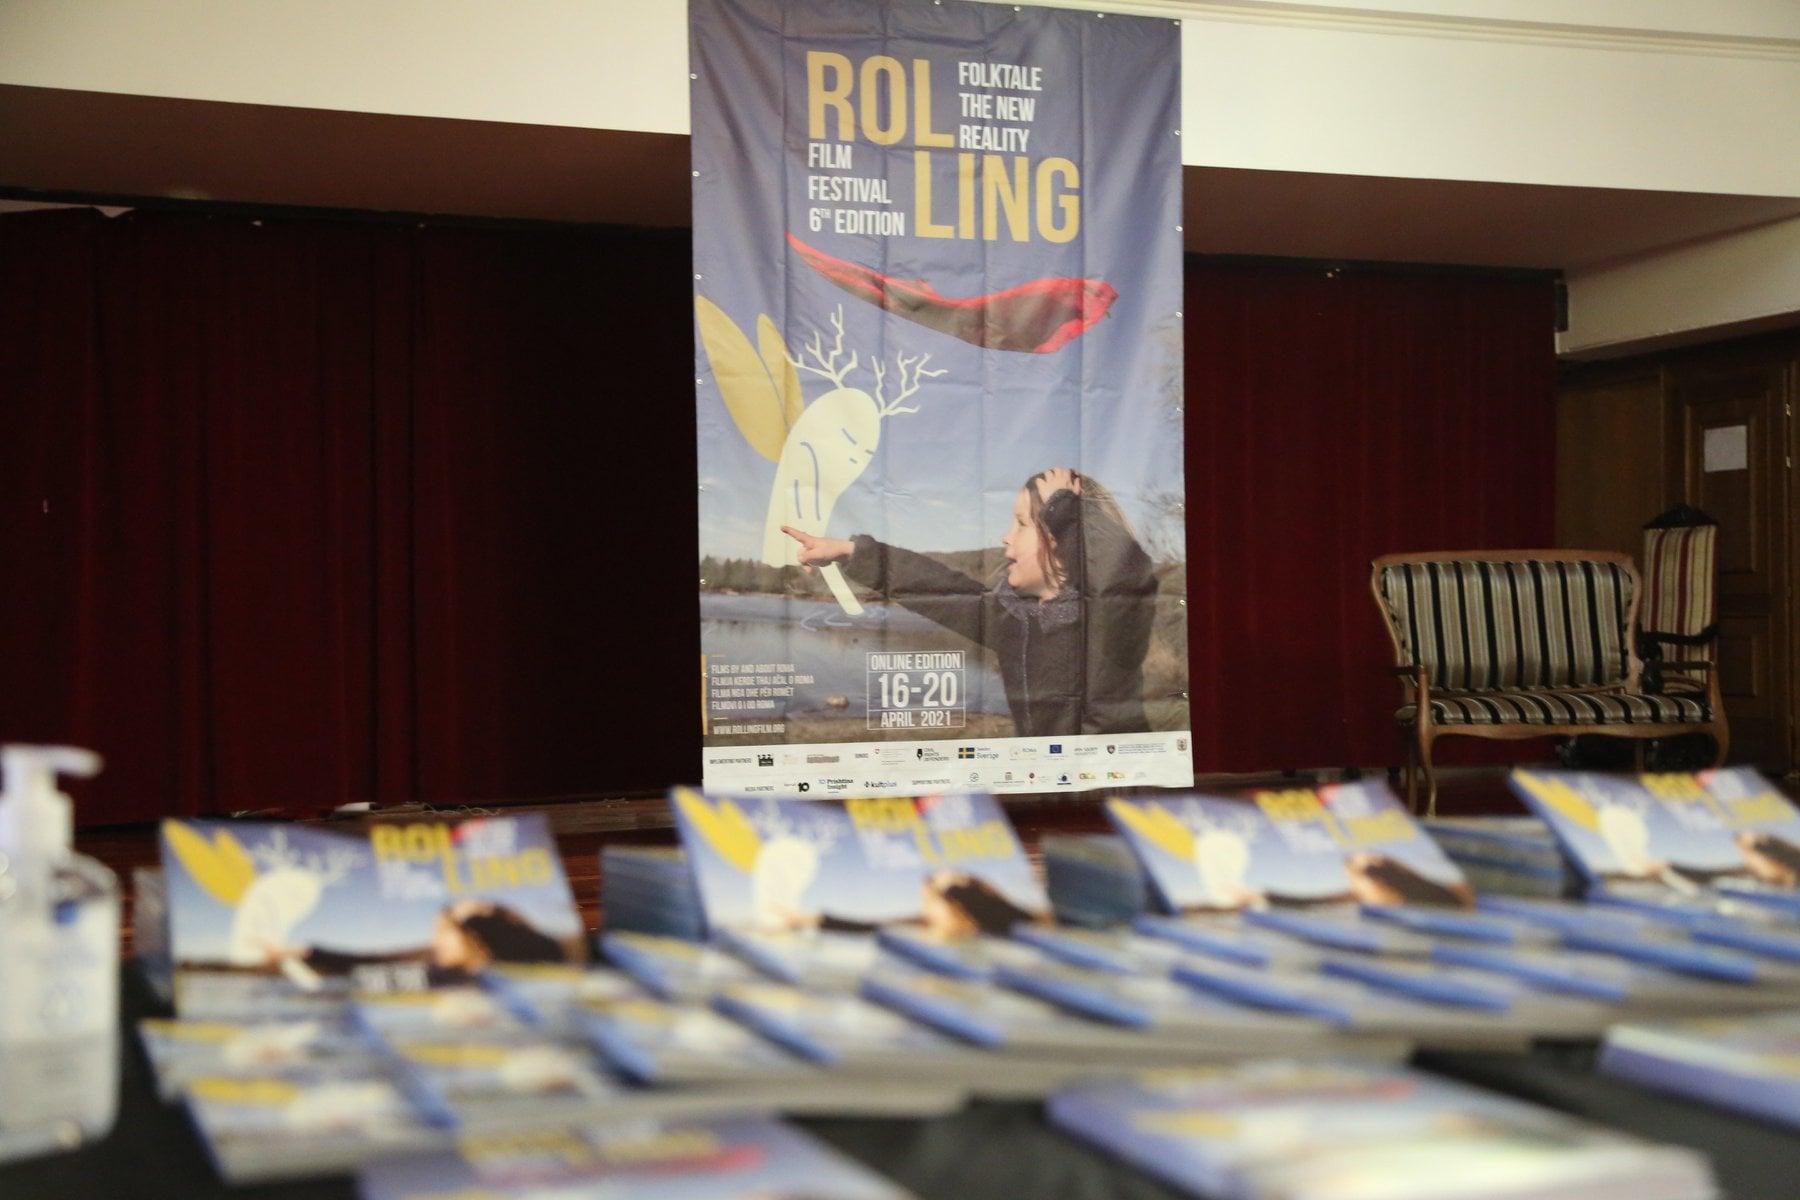 (photo: Rolling Film Festival)